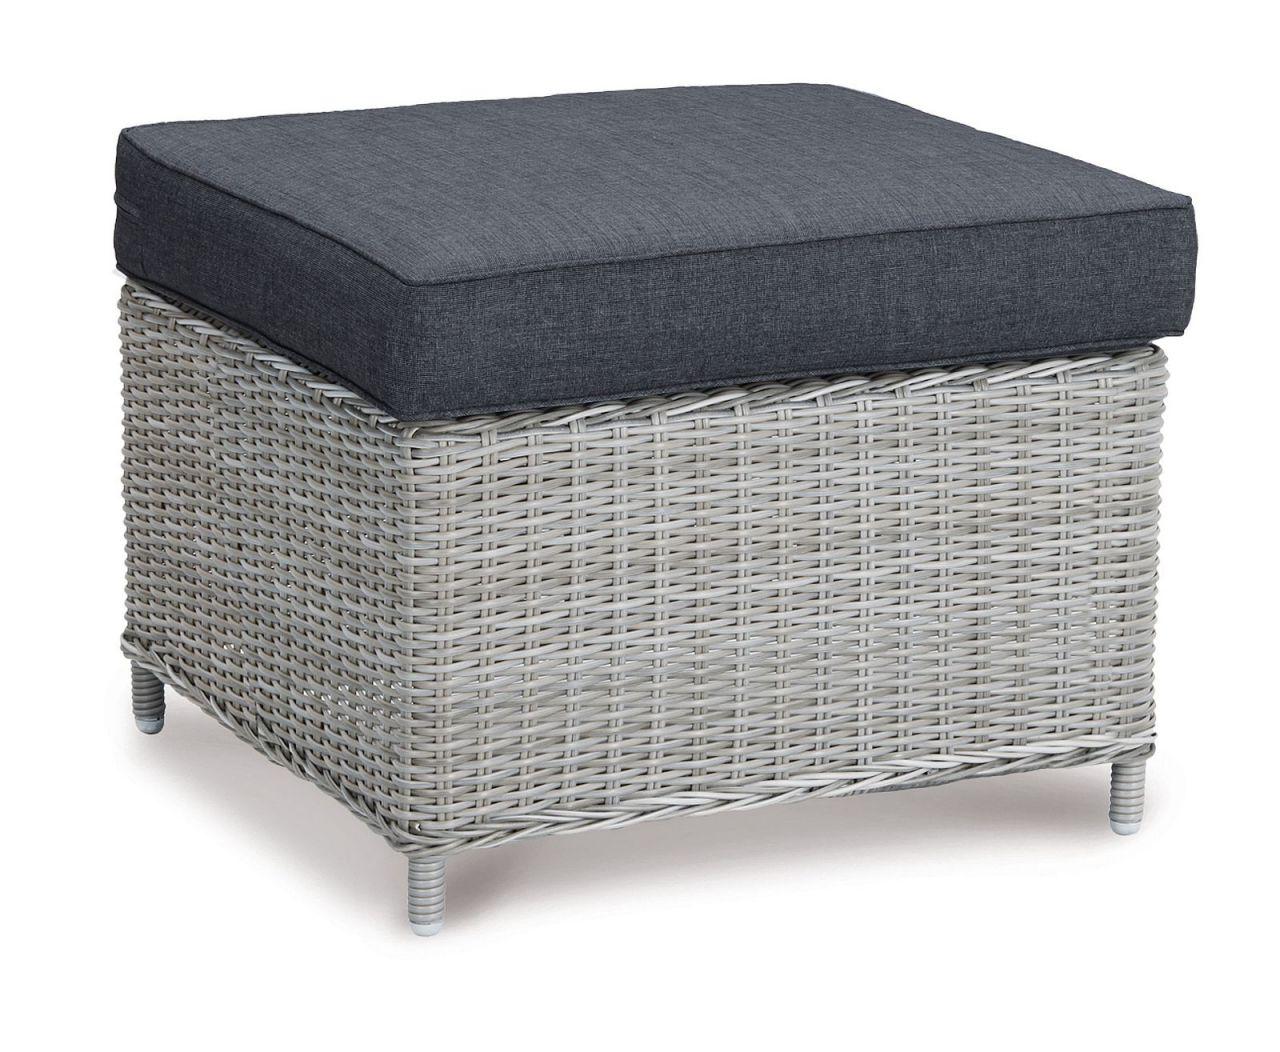 hocker outdoor fu hocker inkl polster rattan grau meliert 65 x 65 cm bf bahamas kaufen bei eh. Black Bedroom Furniture Sets. Home Design Ideas